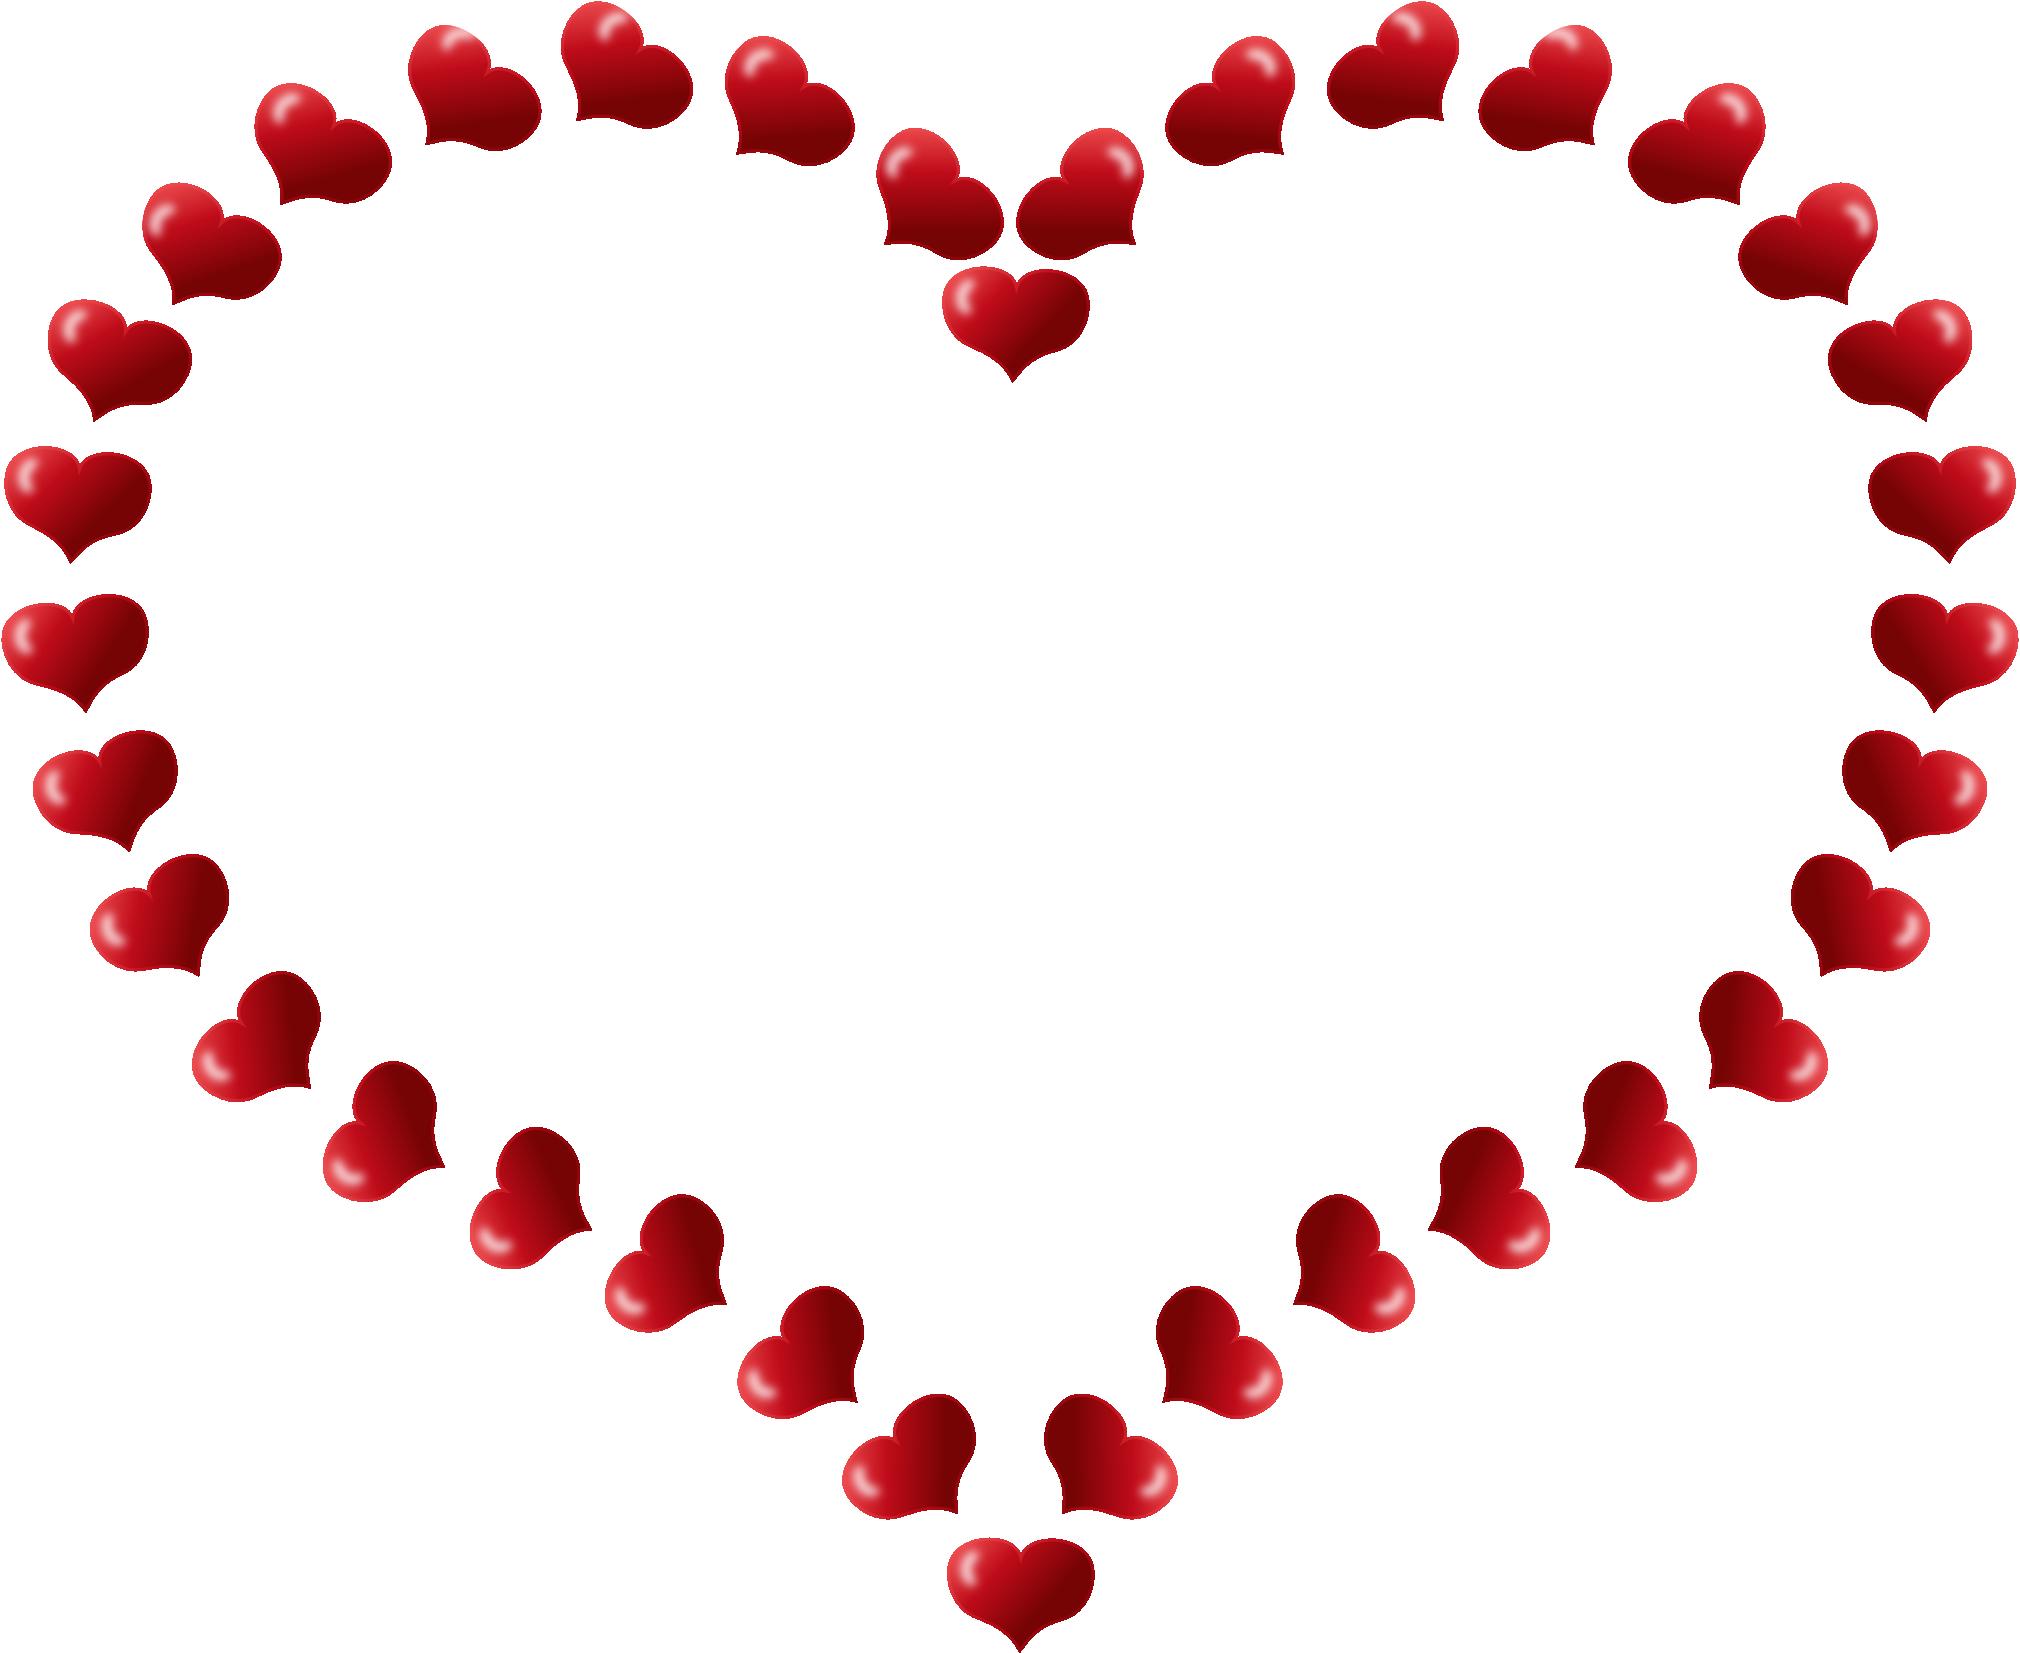 Hearts Border Clip Art - ClipArt Best